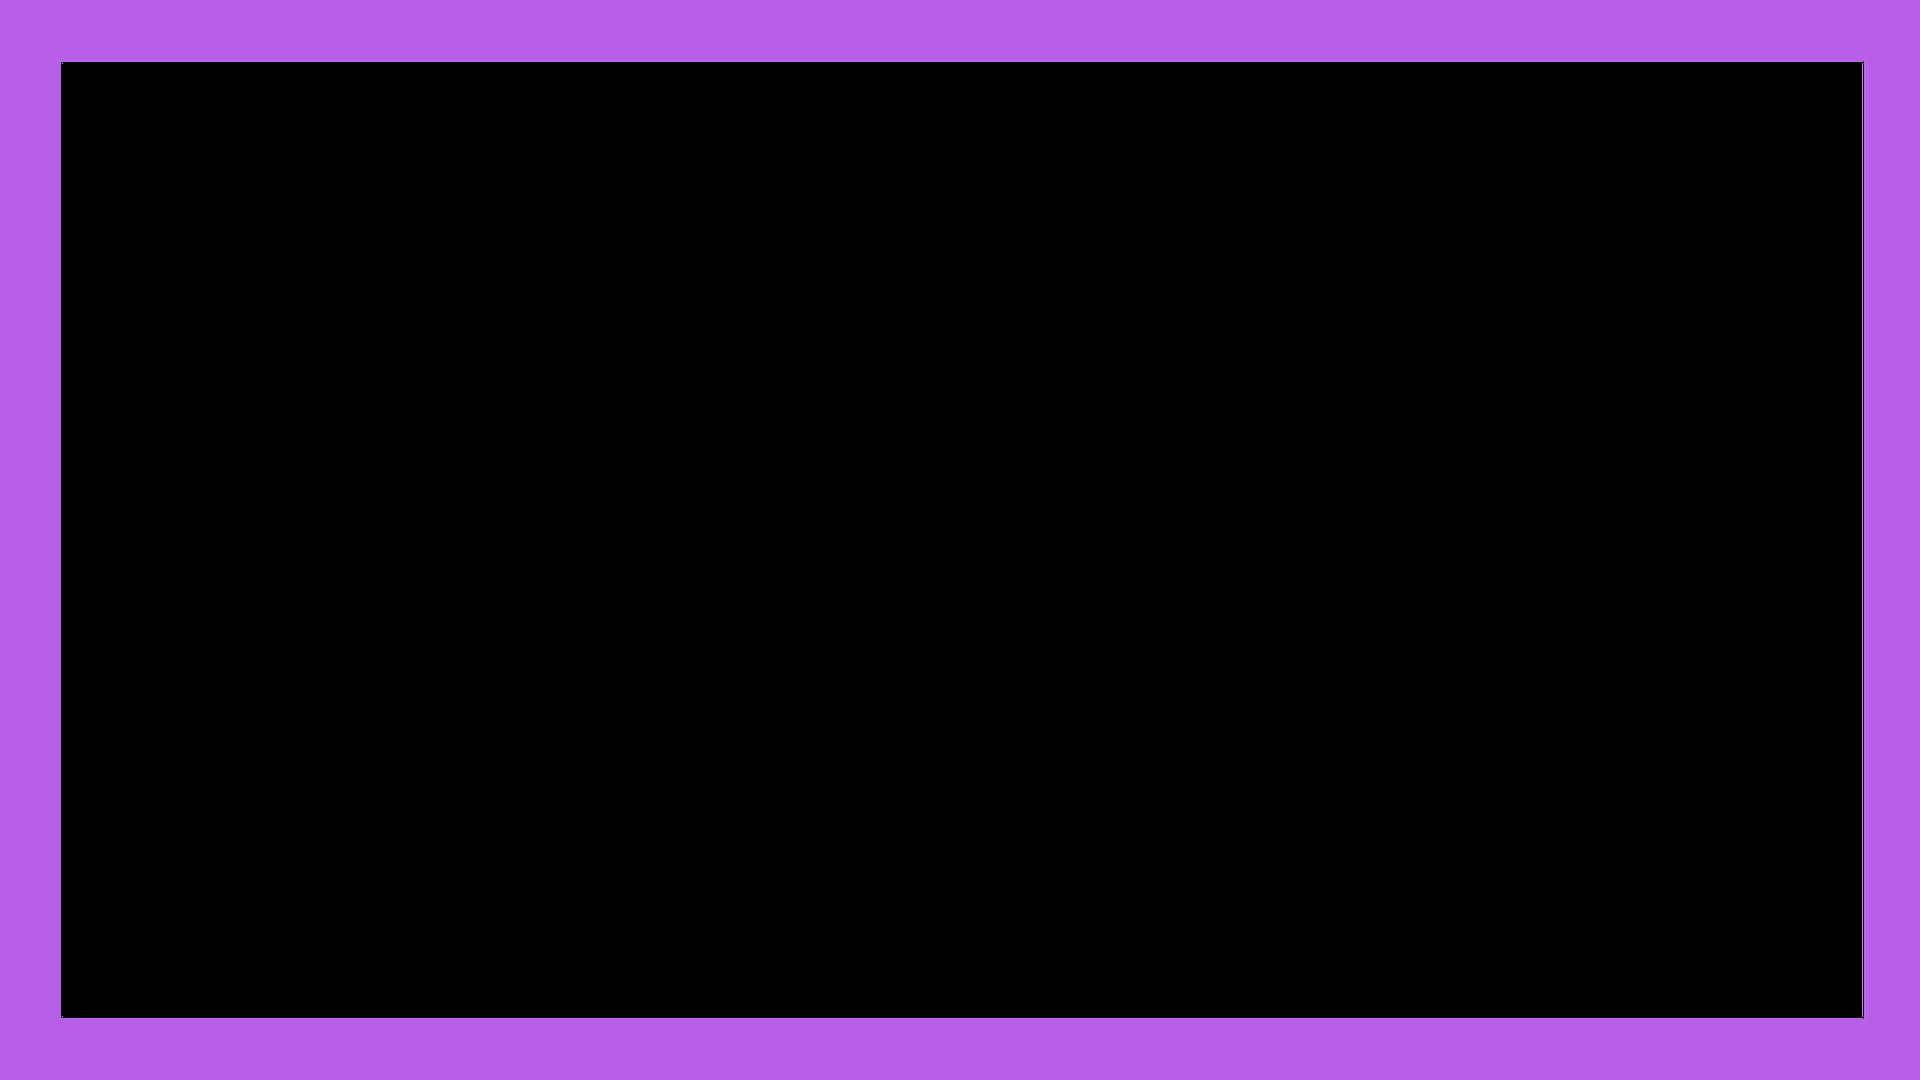 Free download . Purple border png